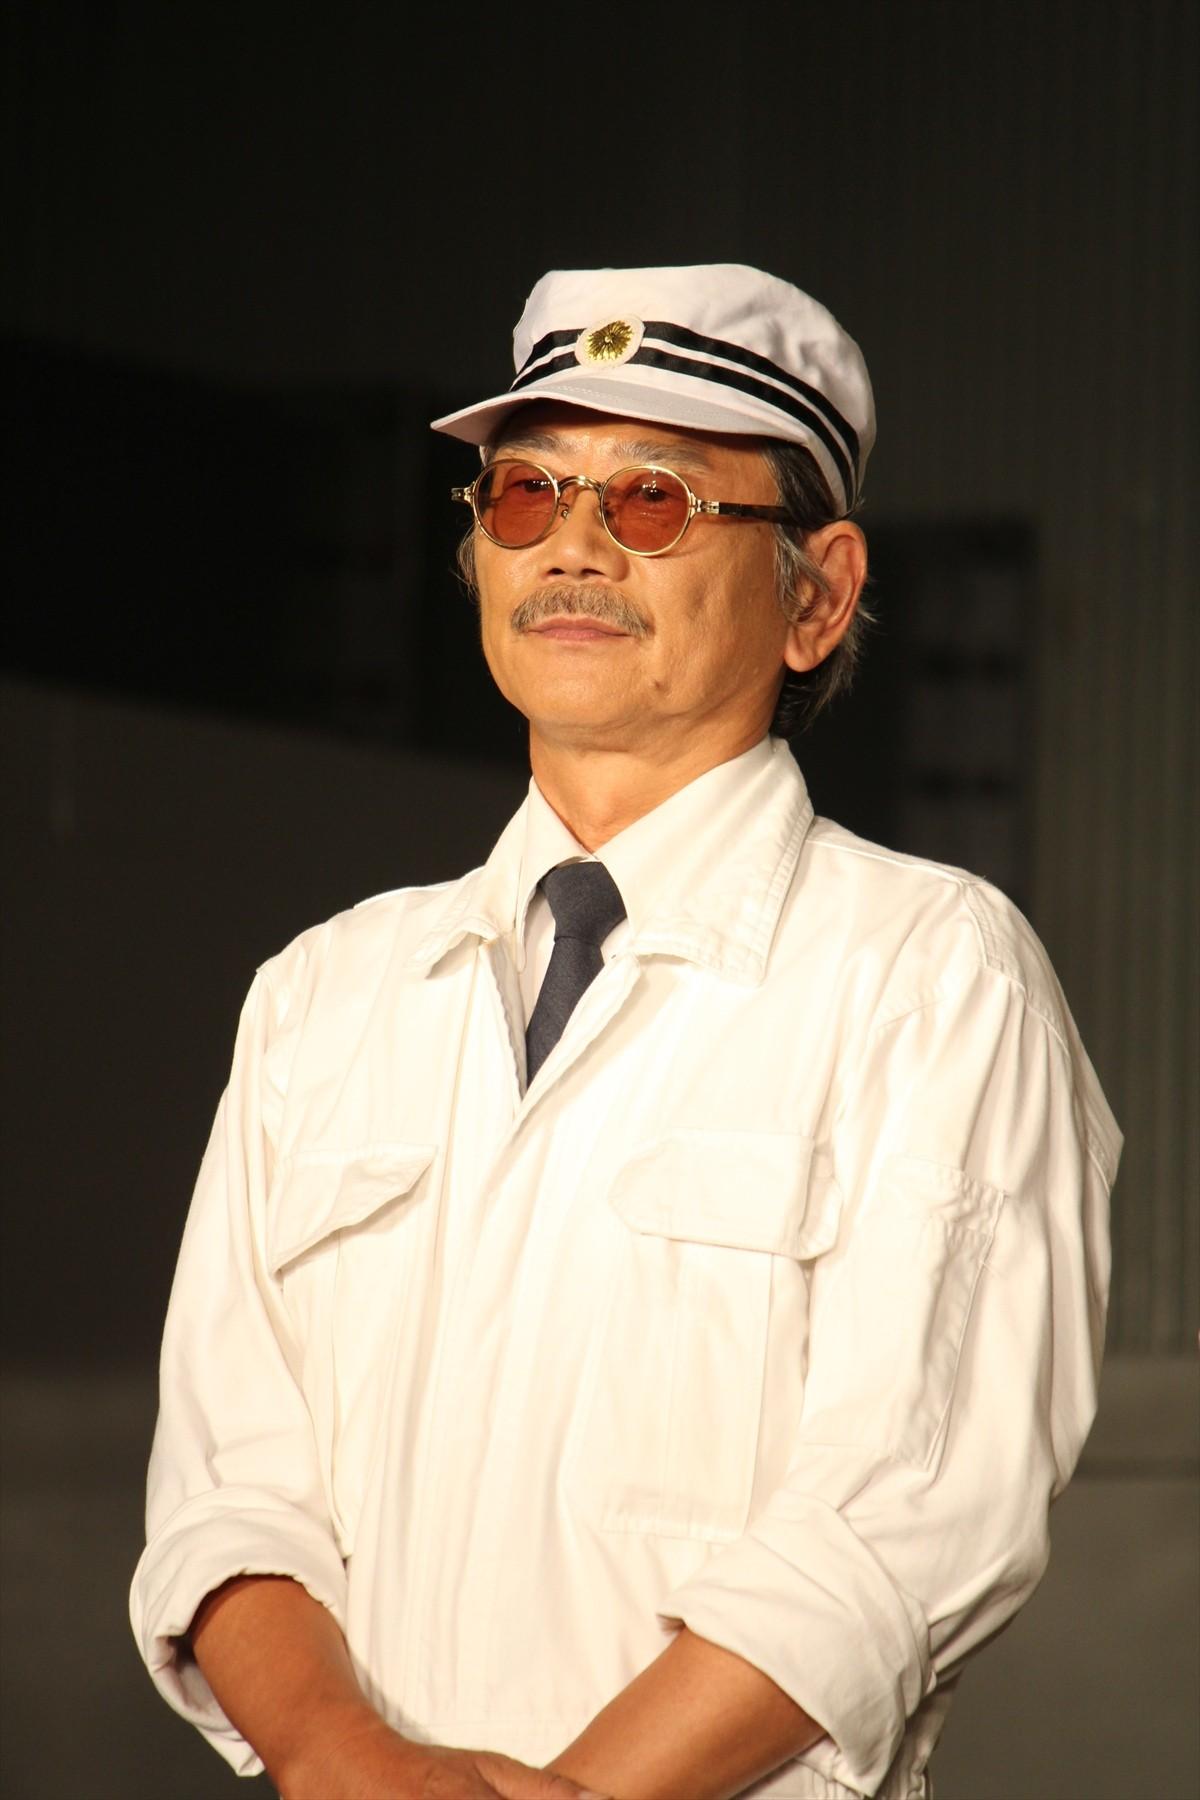 Acteur Shigeru Chiba